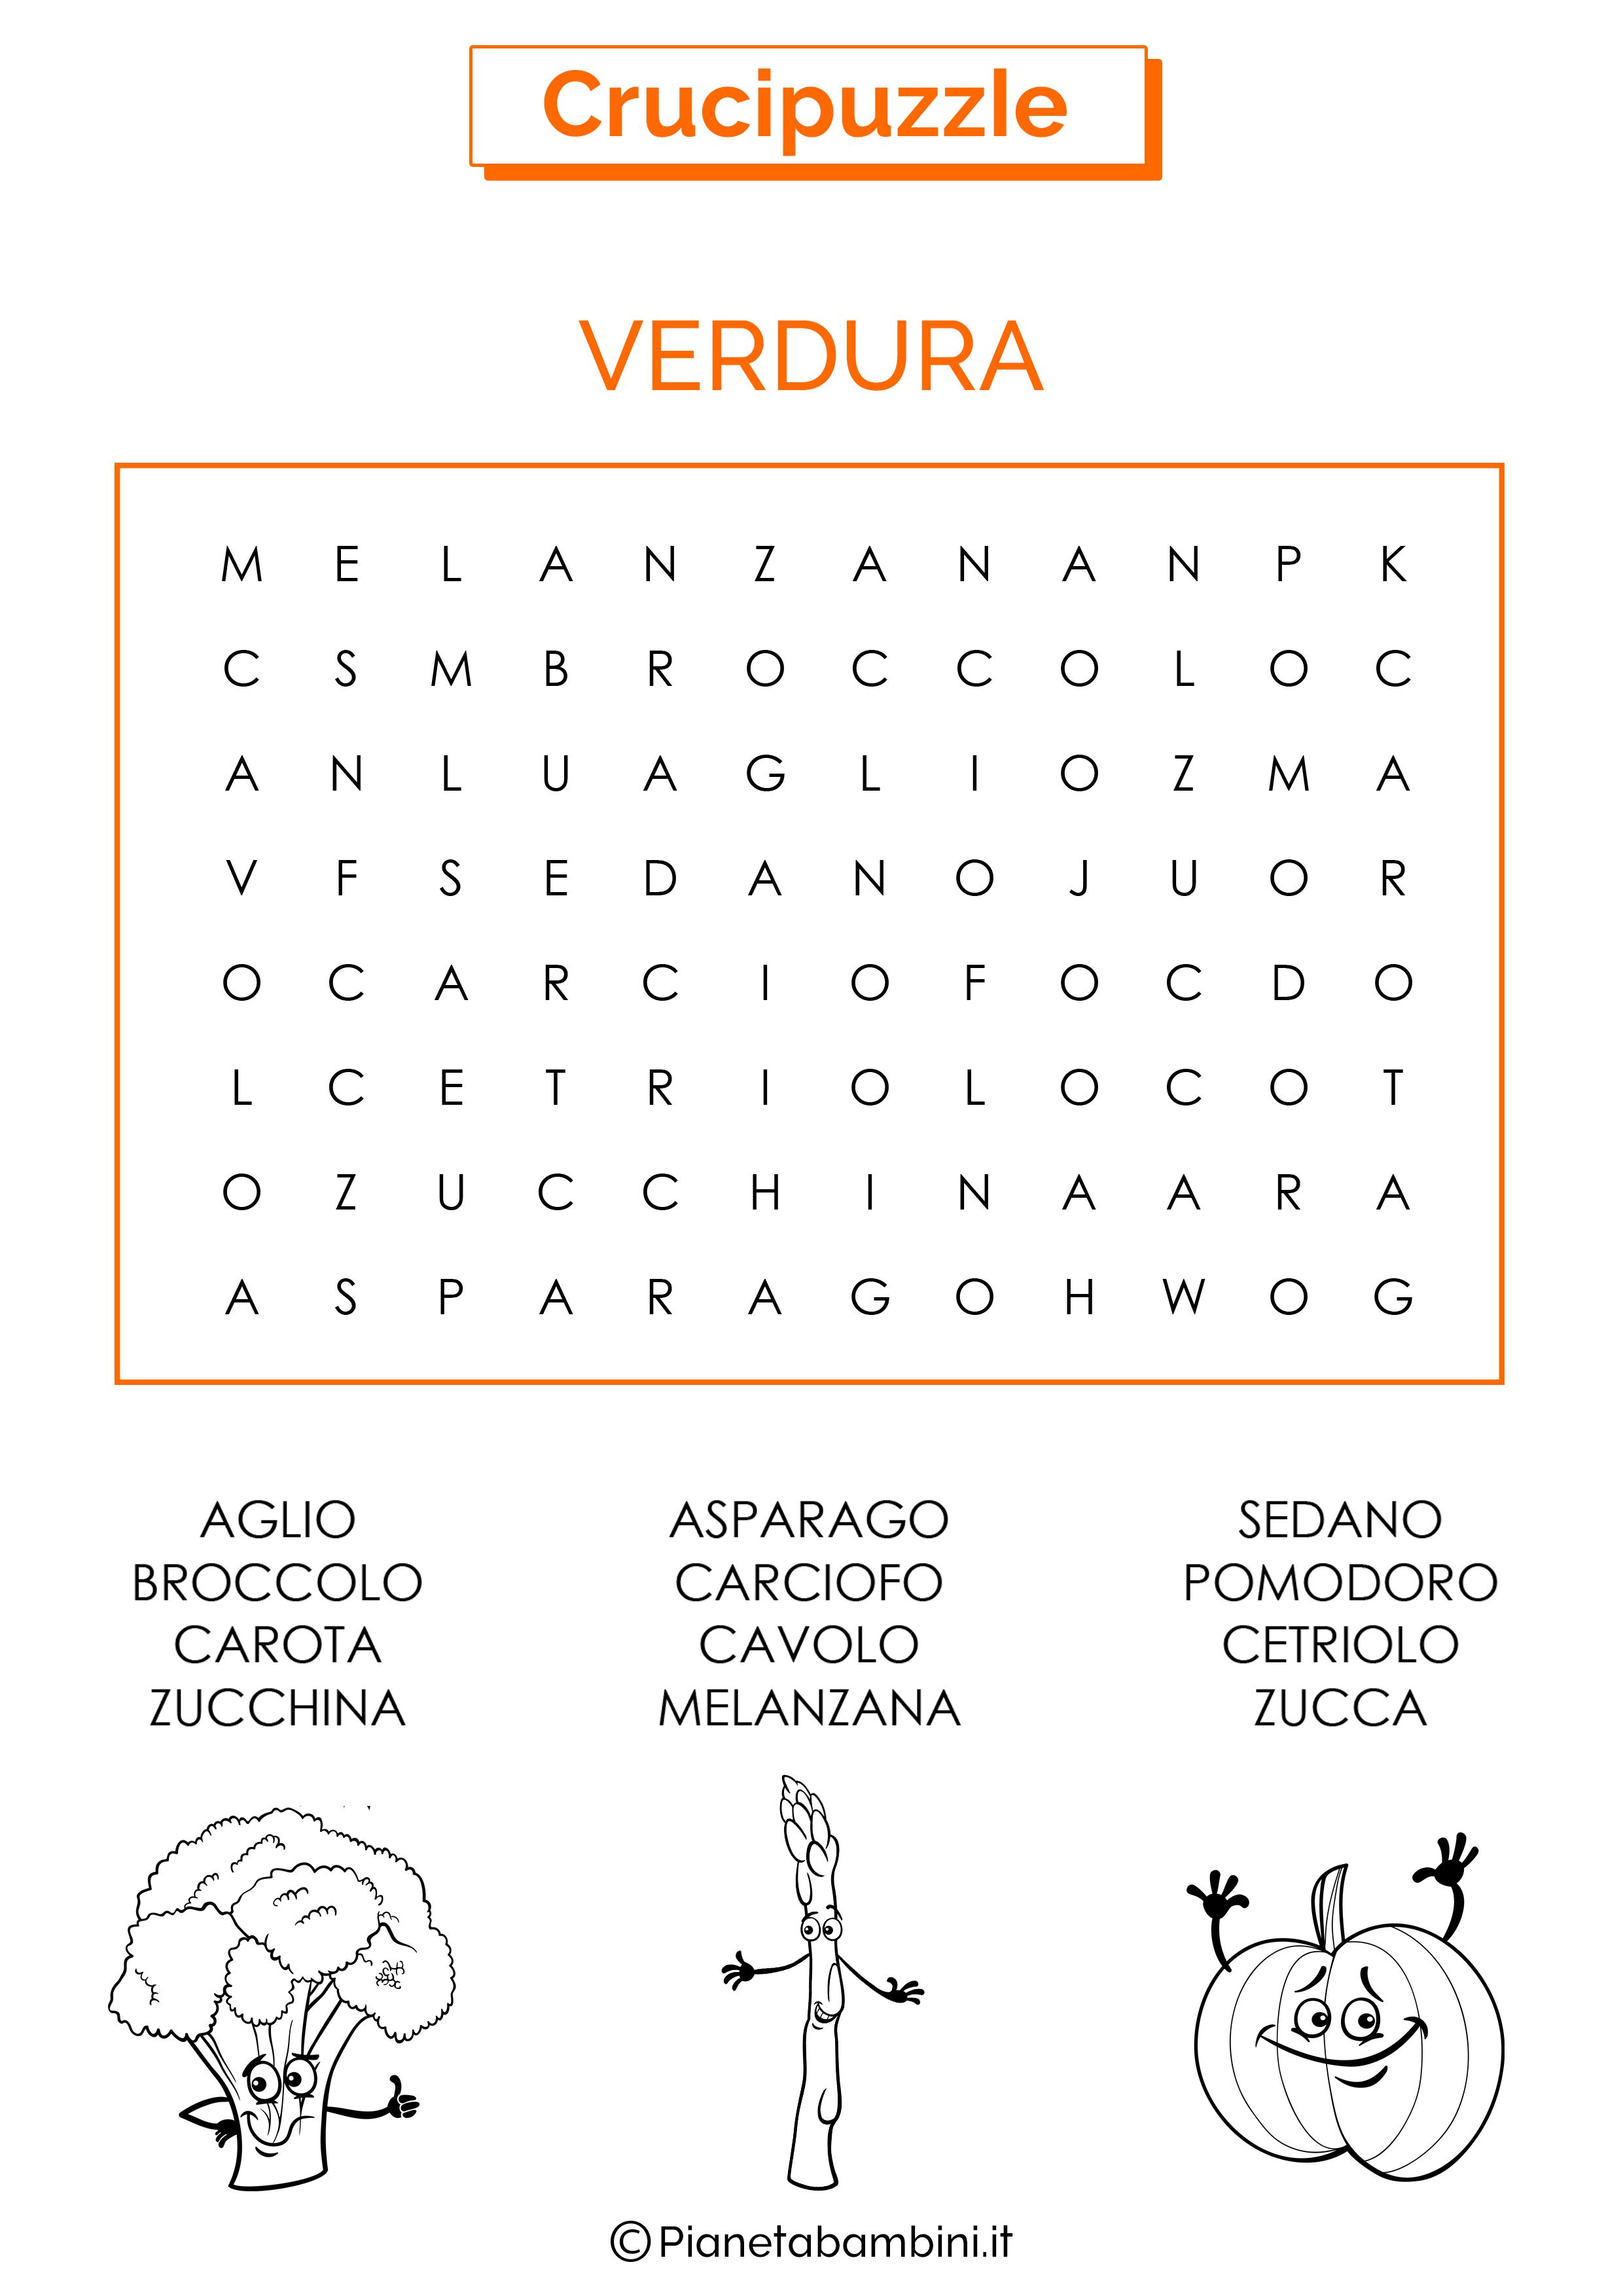 Crucipuzzle facile sulla verdura